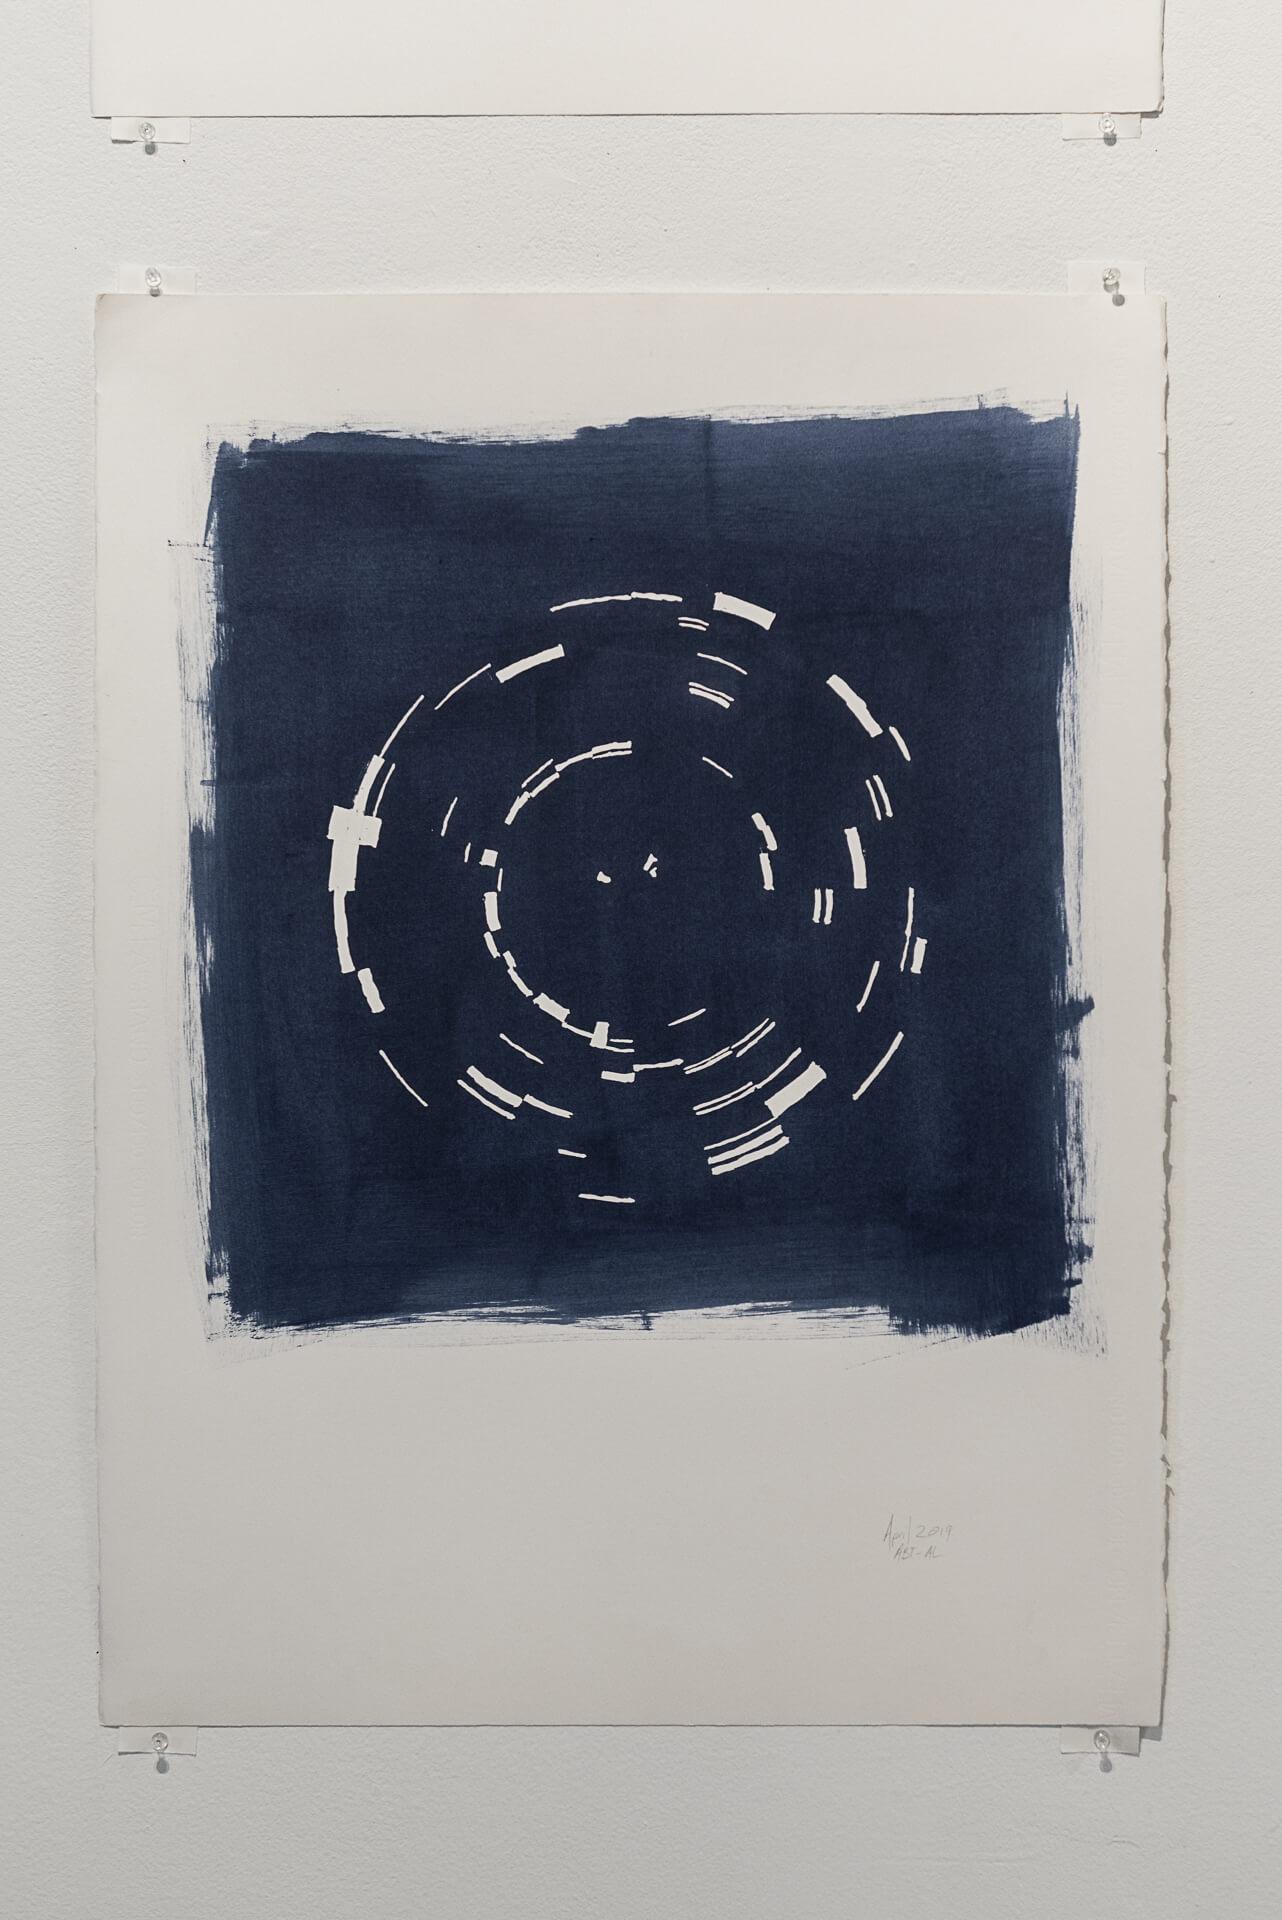 Indigo April 2019   Acrylic on paper, 30 x 22 inches